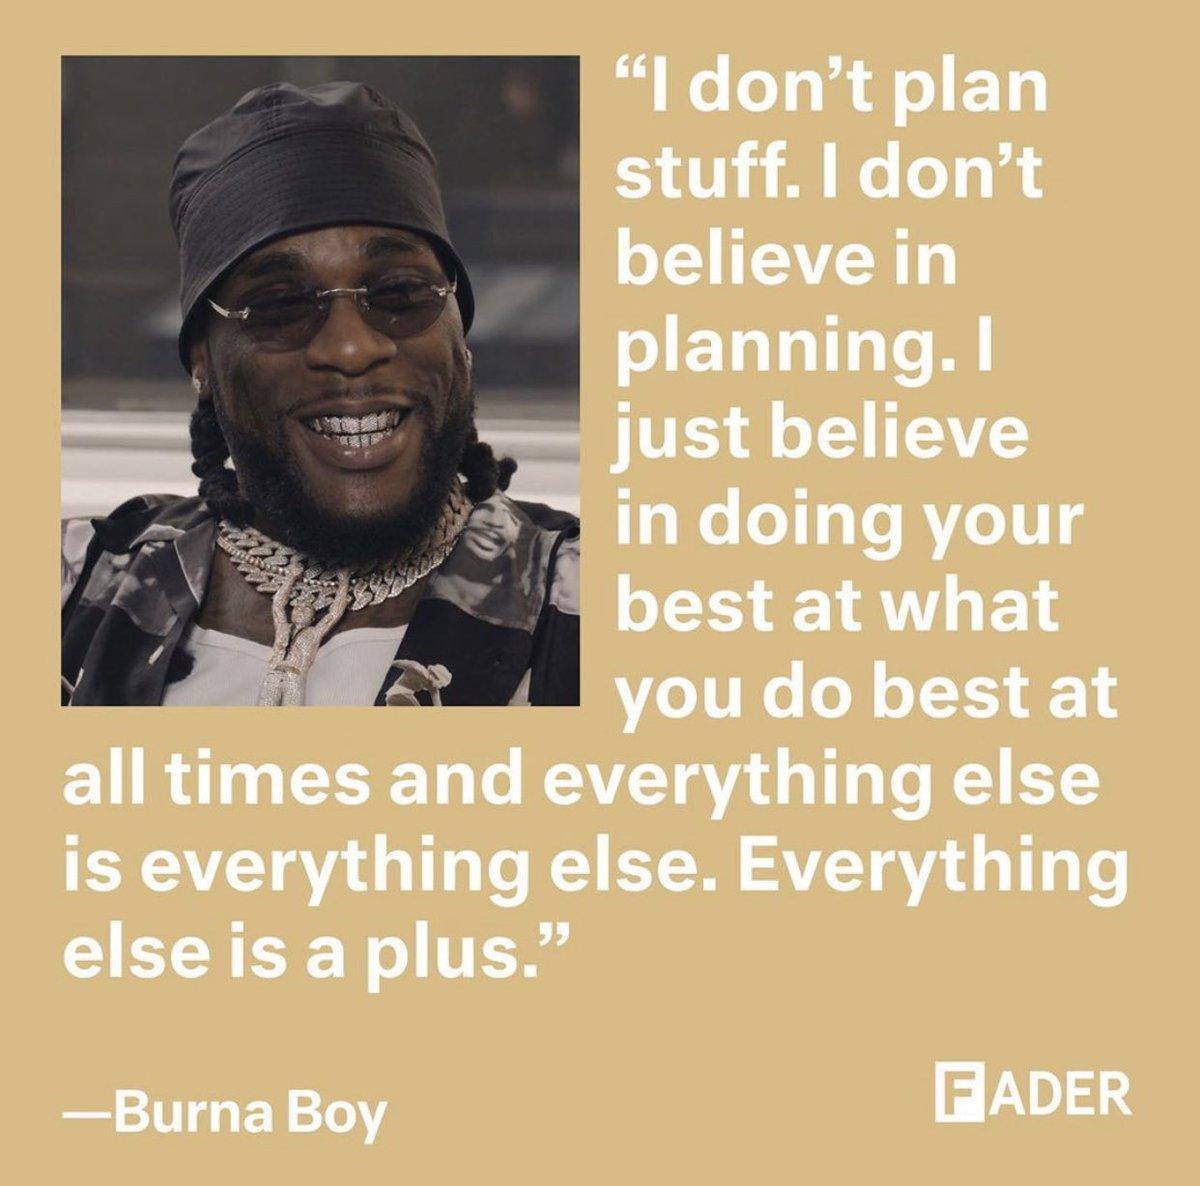 Burna Boy on Twitter: